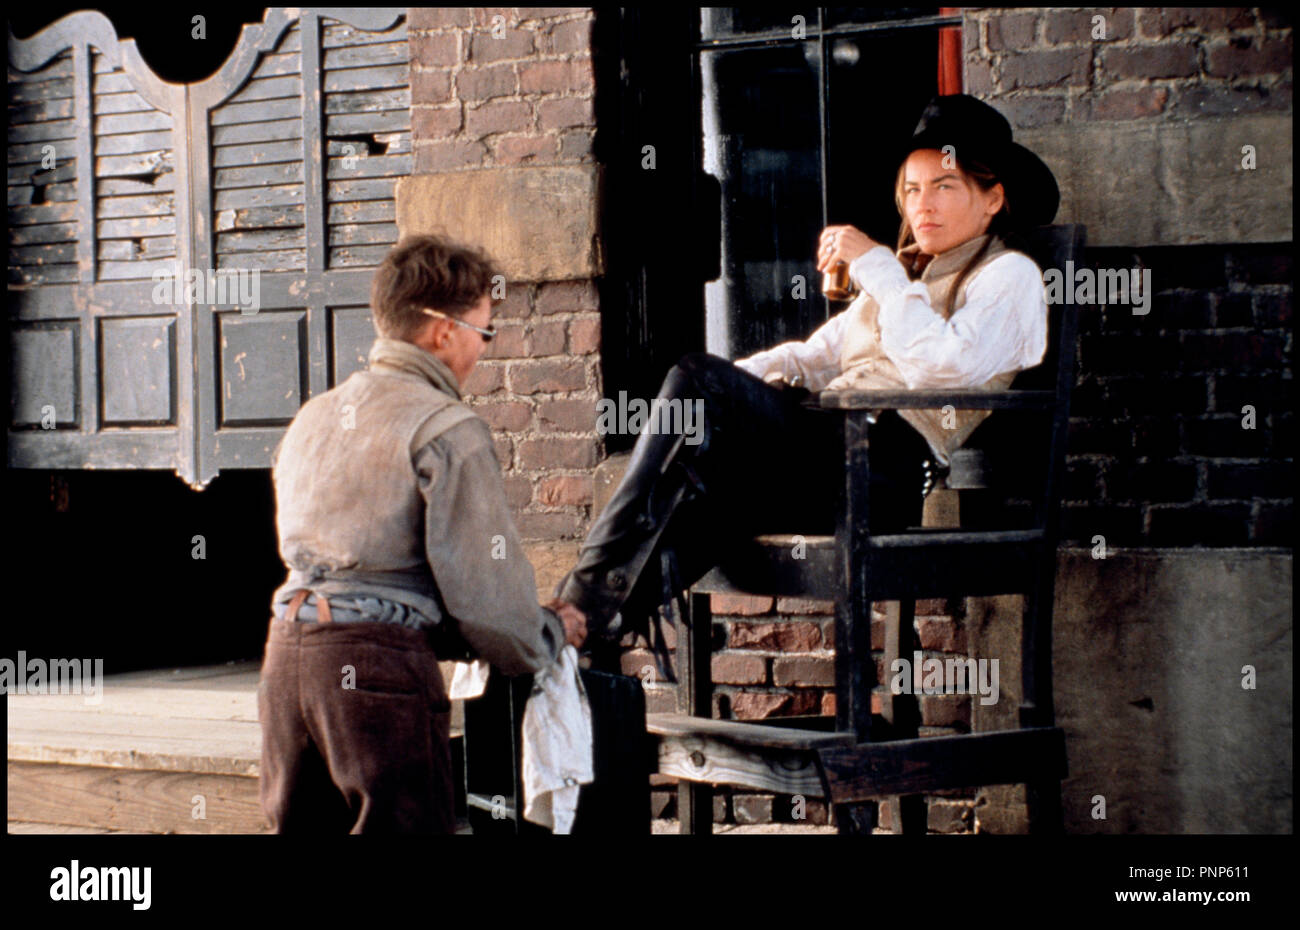 Prod DB © TriStar / DR MORT OU VIF (THE QUICK AND THE DEAD) de Sam Raimi 1995 USA / JAP avec Jerry Swindall et Sharon Stone western, cow girl, cireur de chaussures, boire, whisky - Stock Image